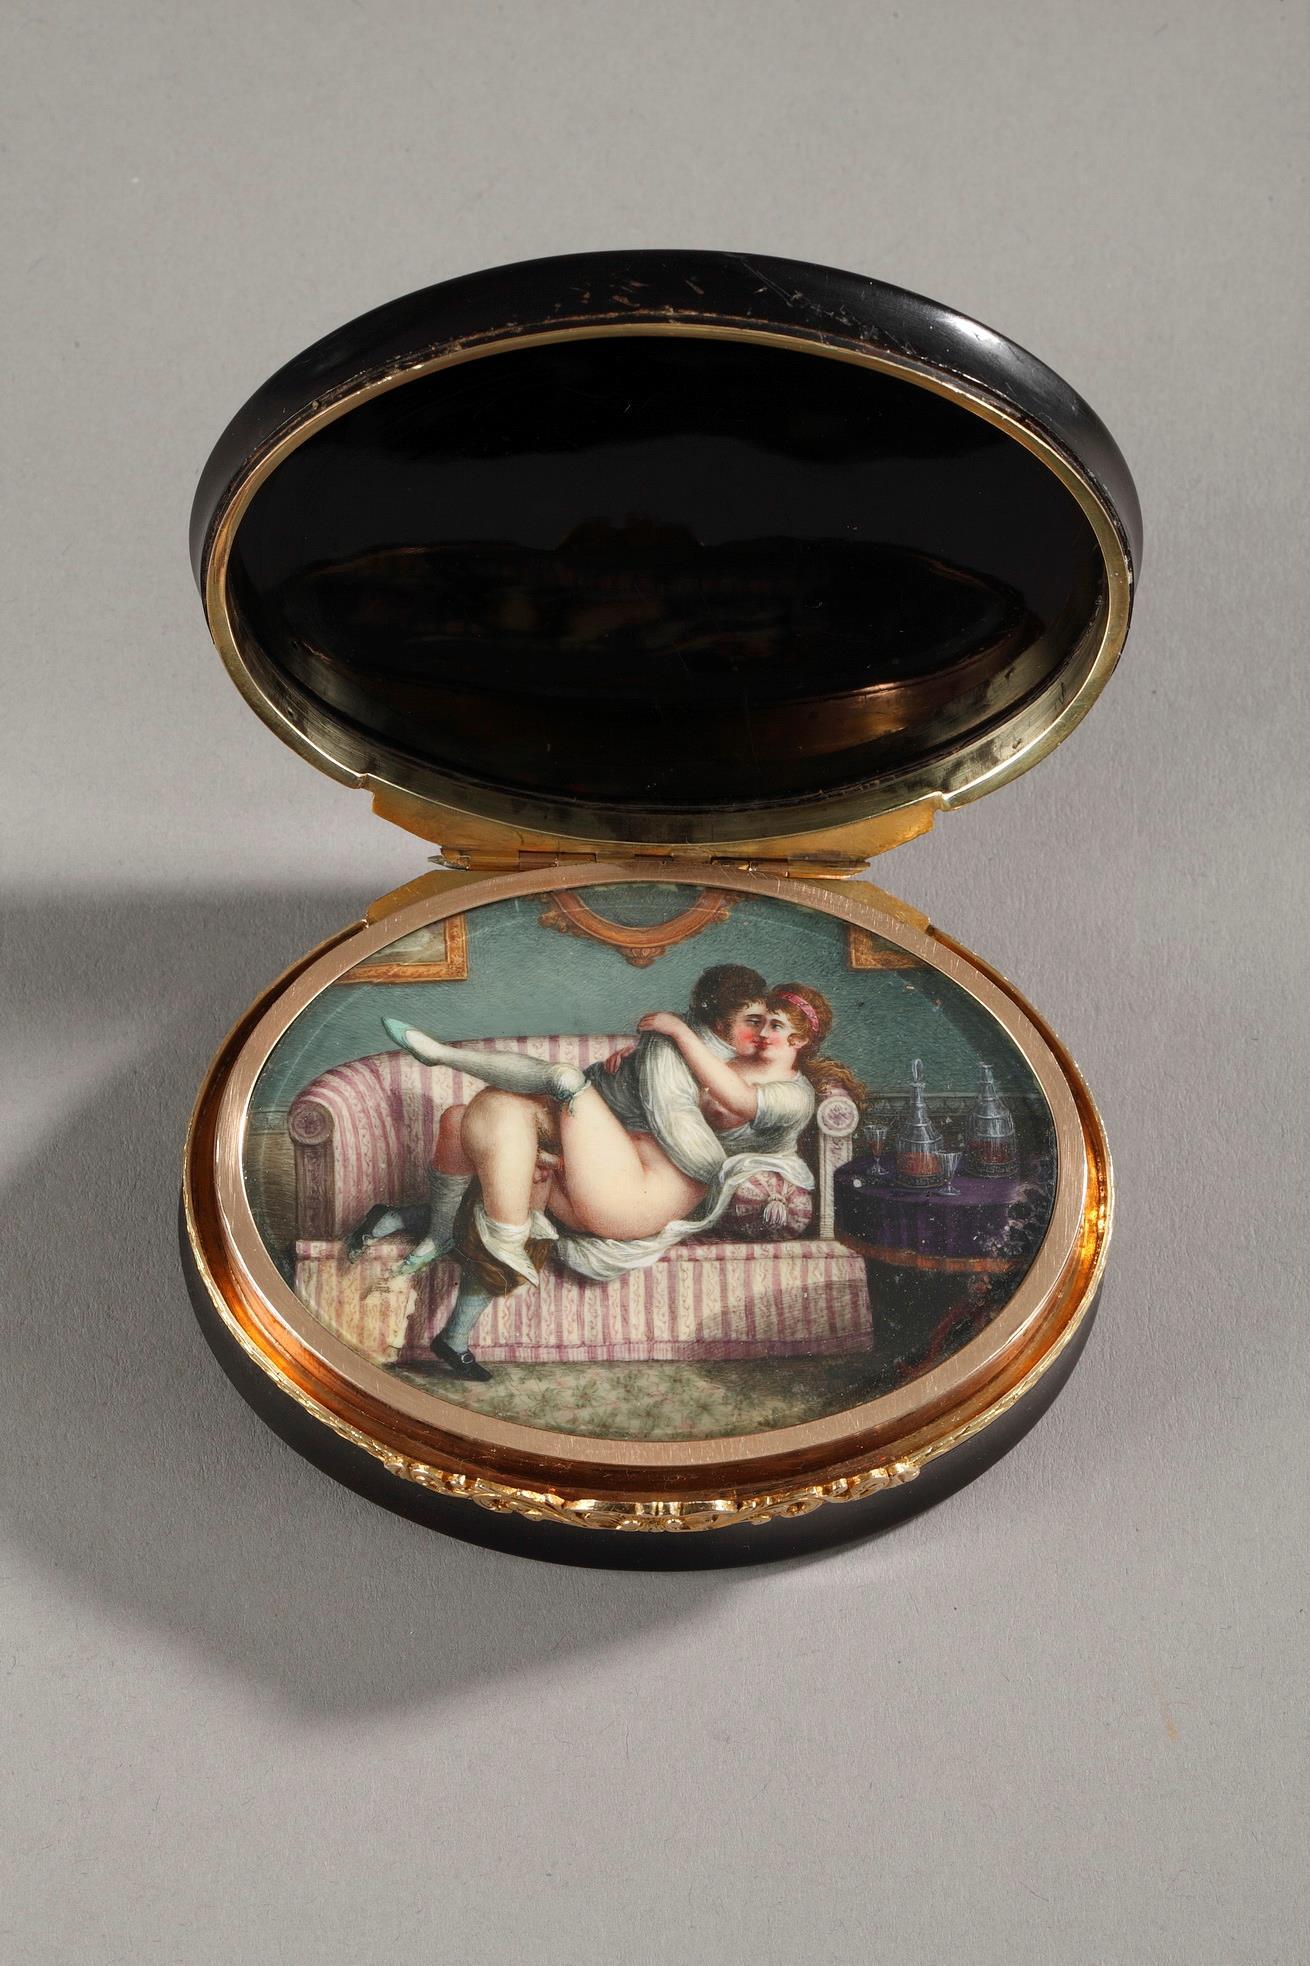 Hidden compartment snuff box tortoiseshell, gold and erotic miniature.<br/> 19th century.